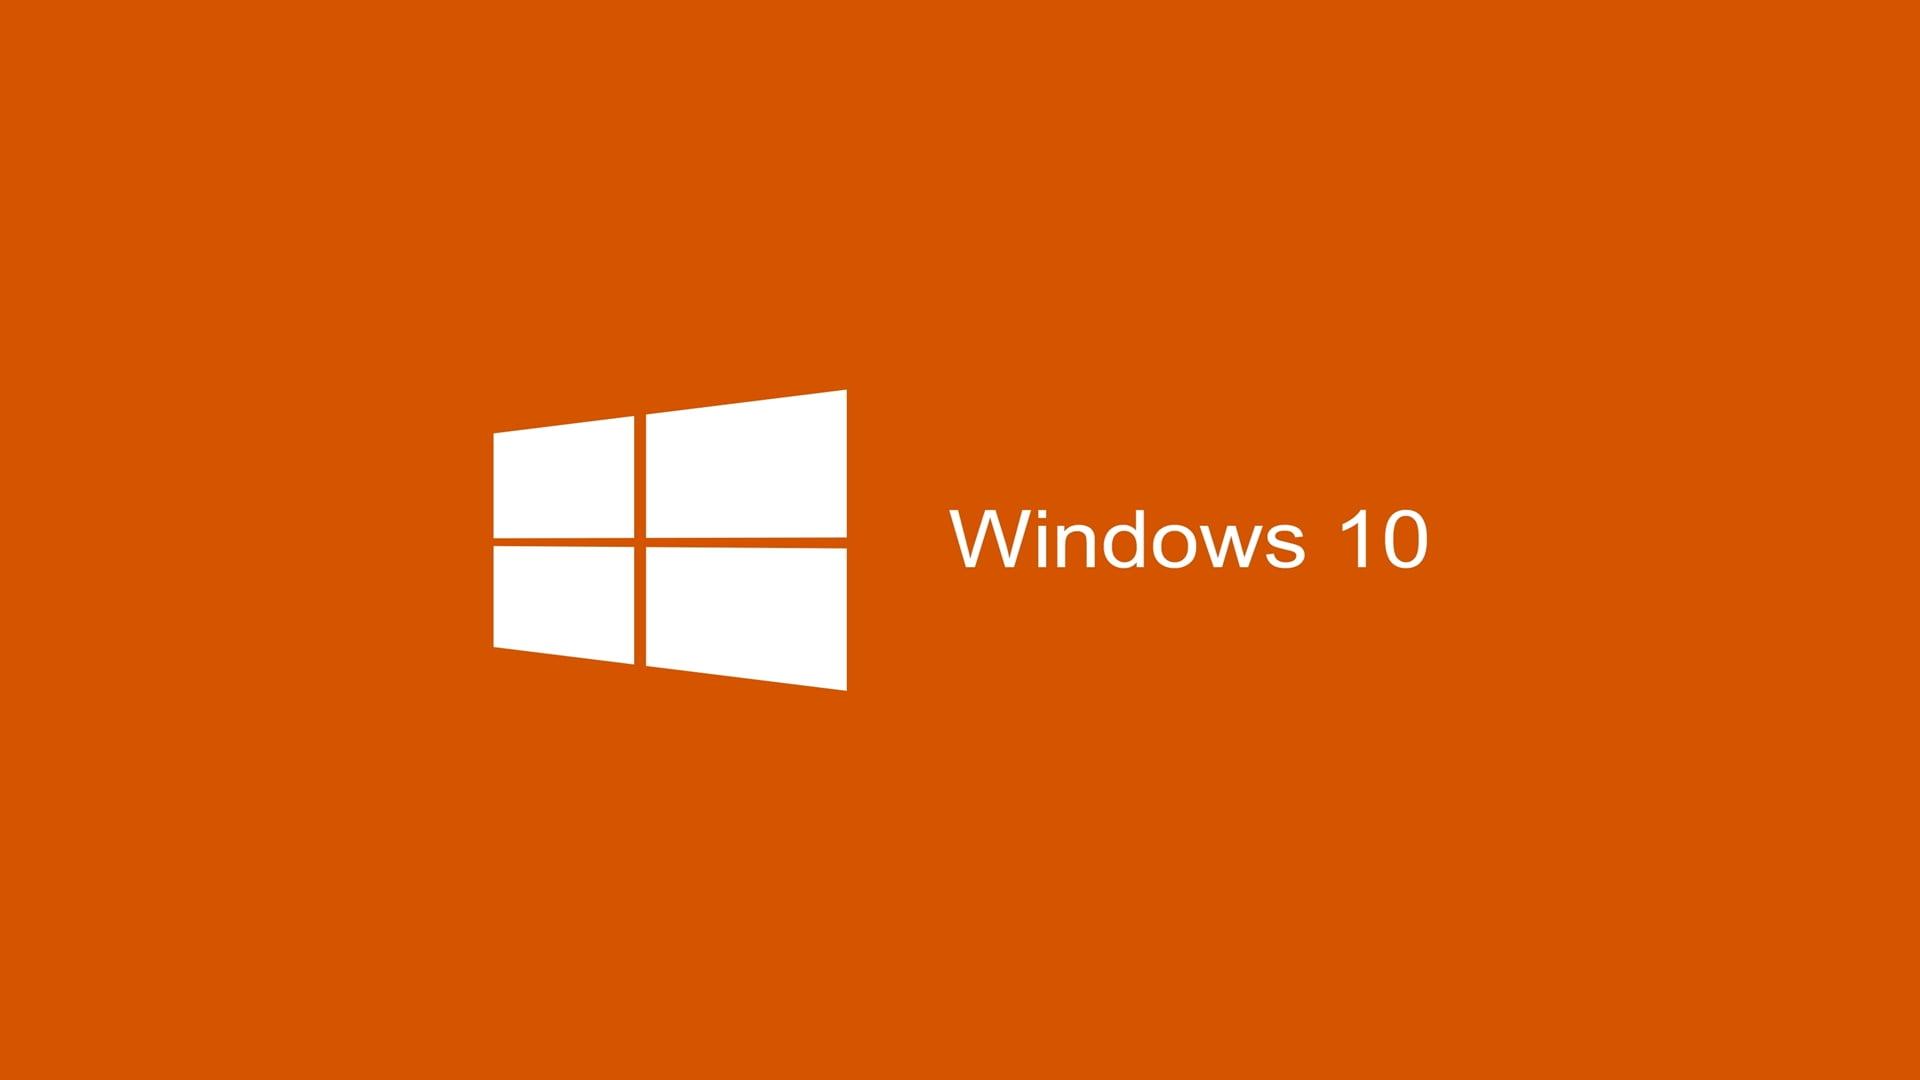 Papéis de parede do Windows 10 11